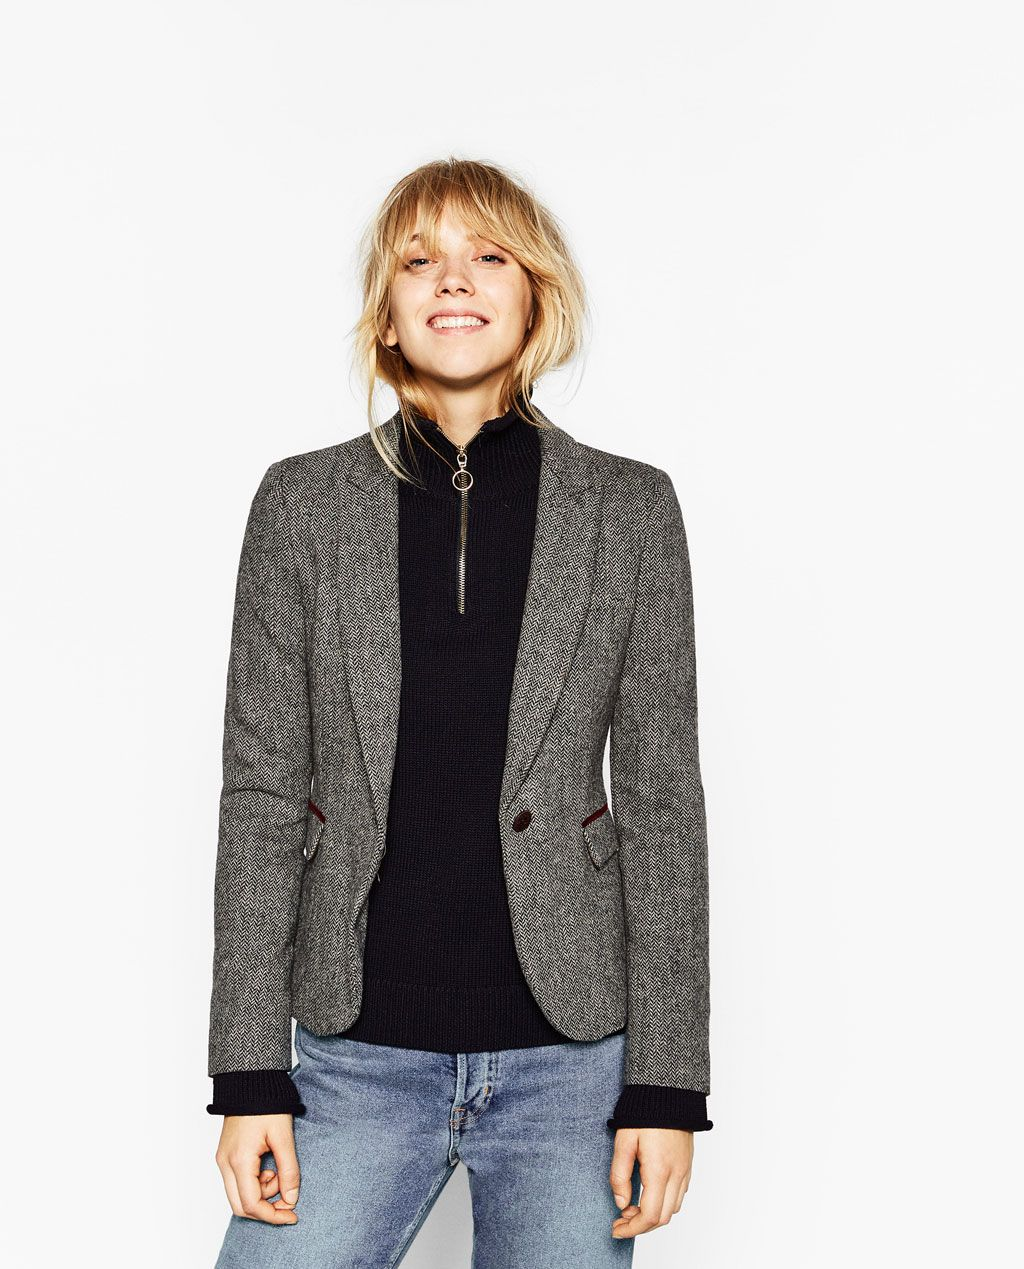 Image 2 of HERRINGBONE BLAZER WITH ELBOW PATCHES from Zara | My ...